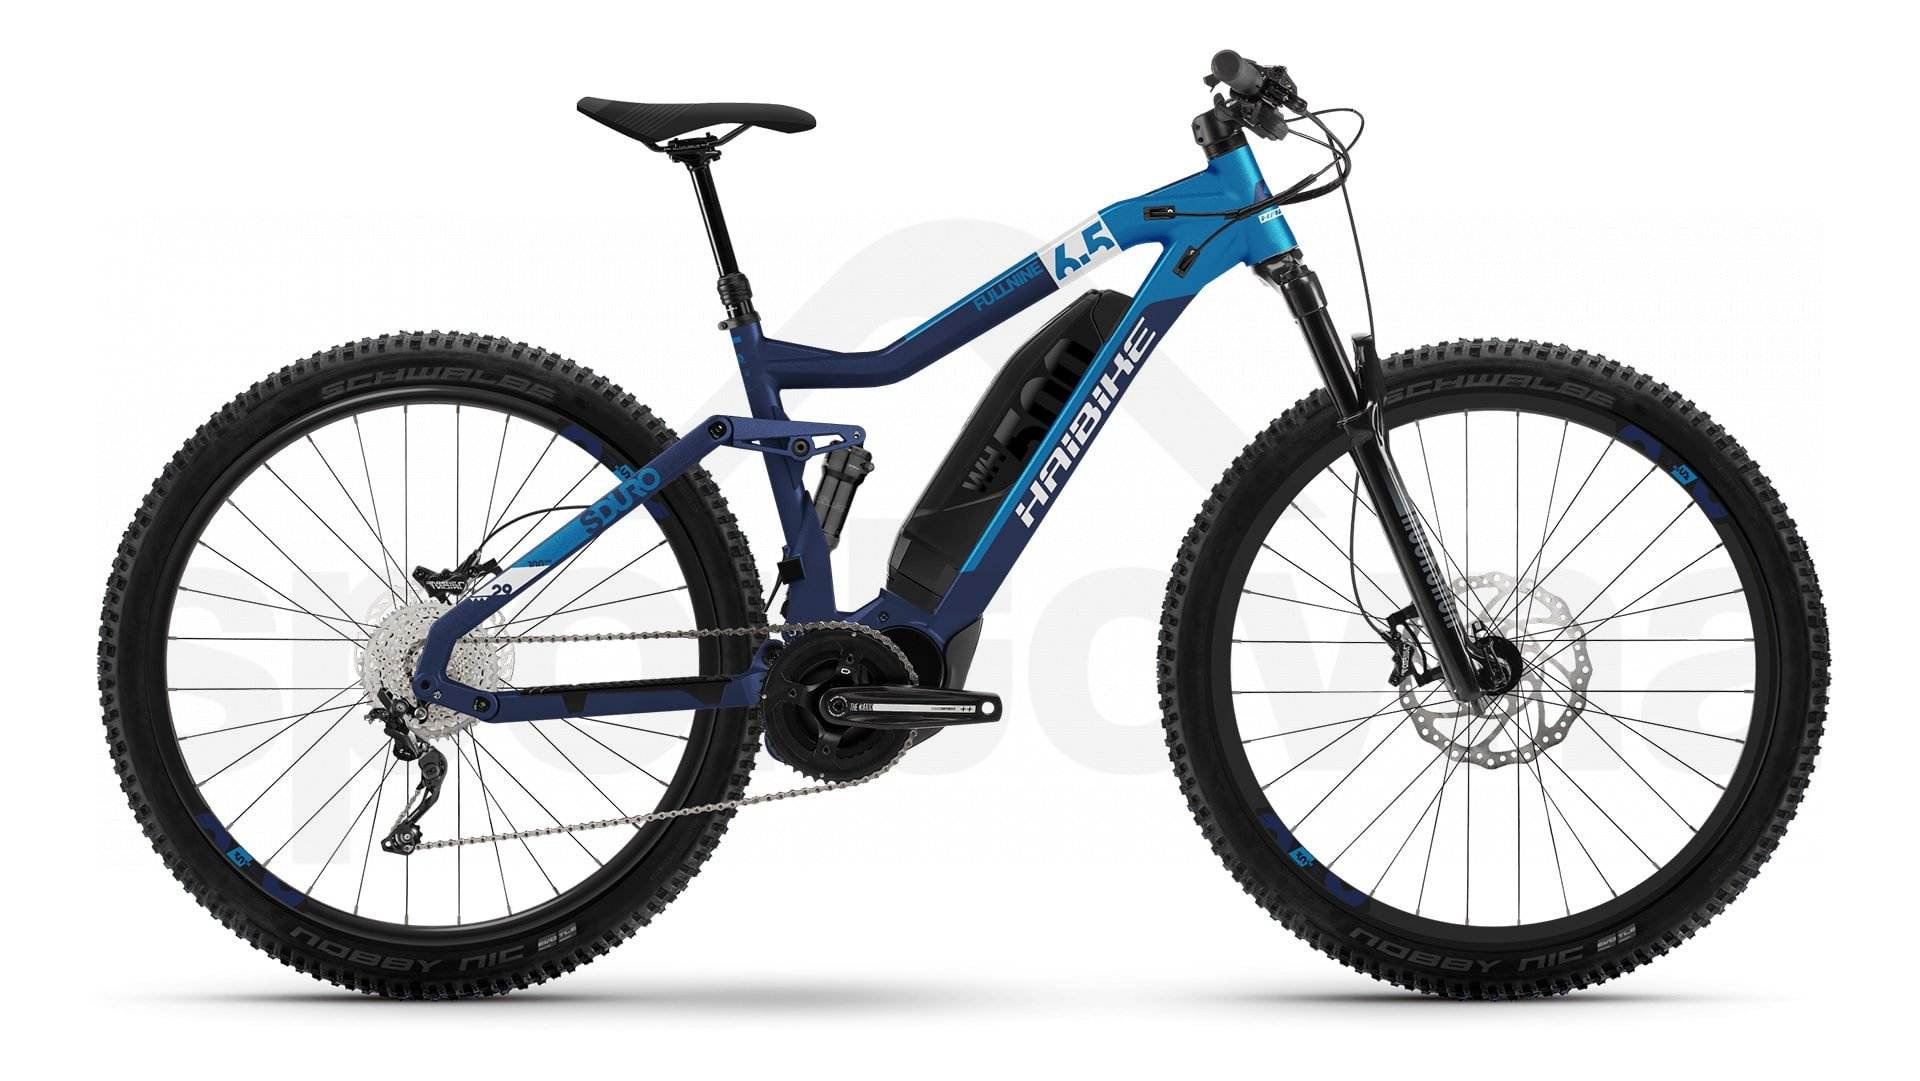 Haibike-fullnine_6.5-elektro_fahrrad-2021-01